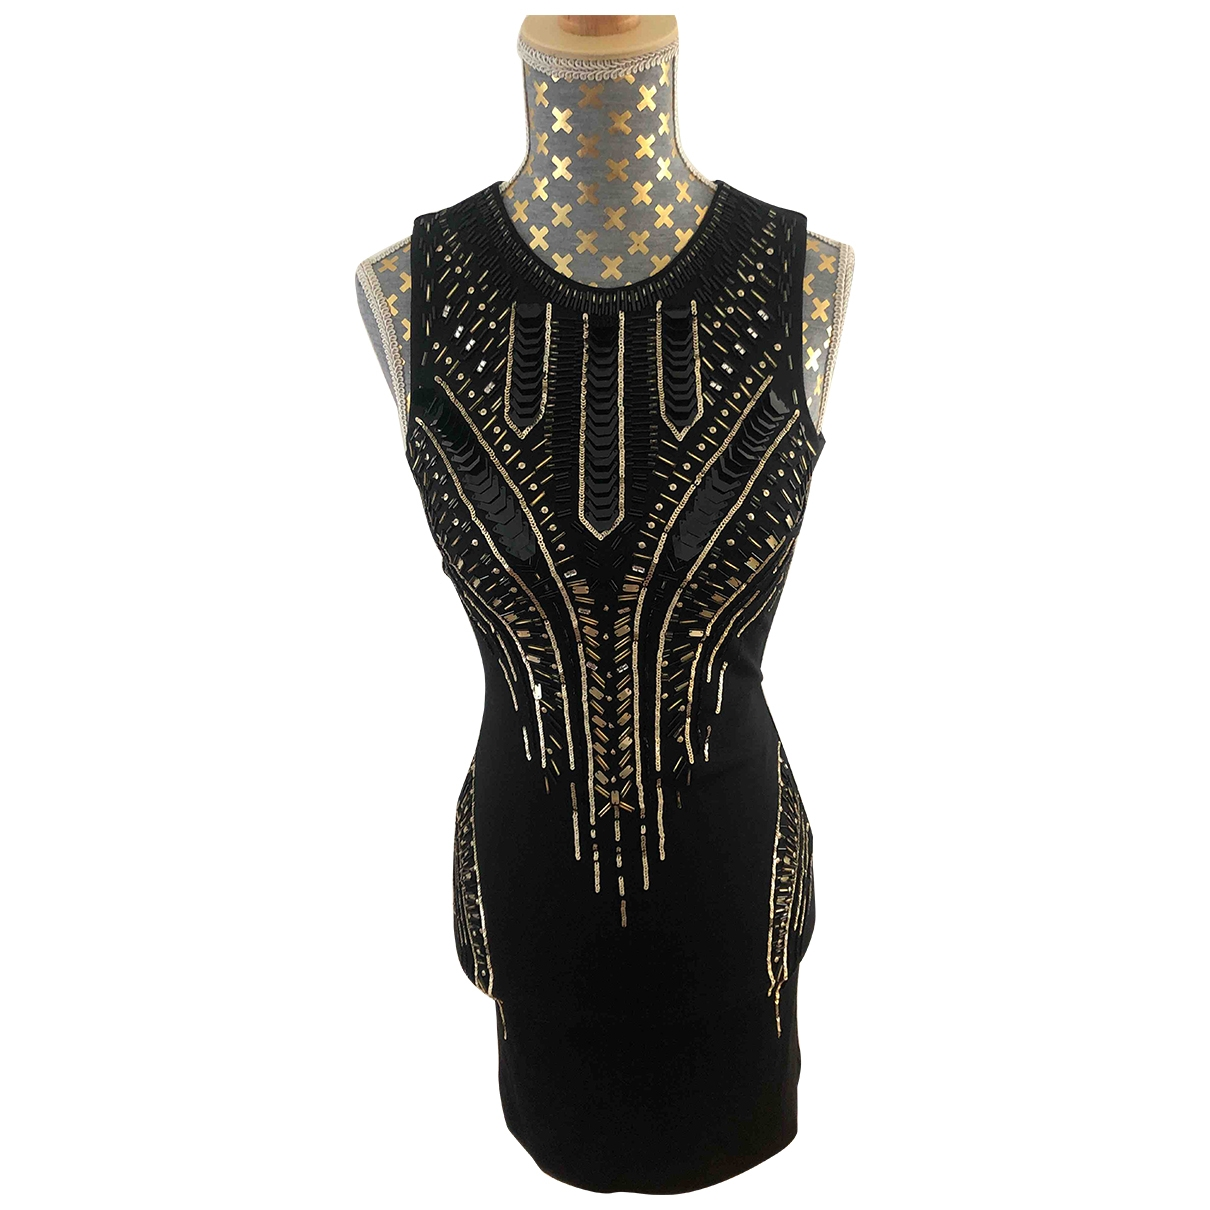 Elisabetta Franchi \N Black dress for Women 40 IT